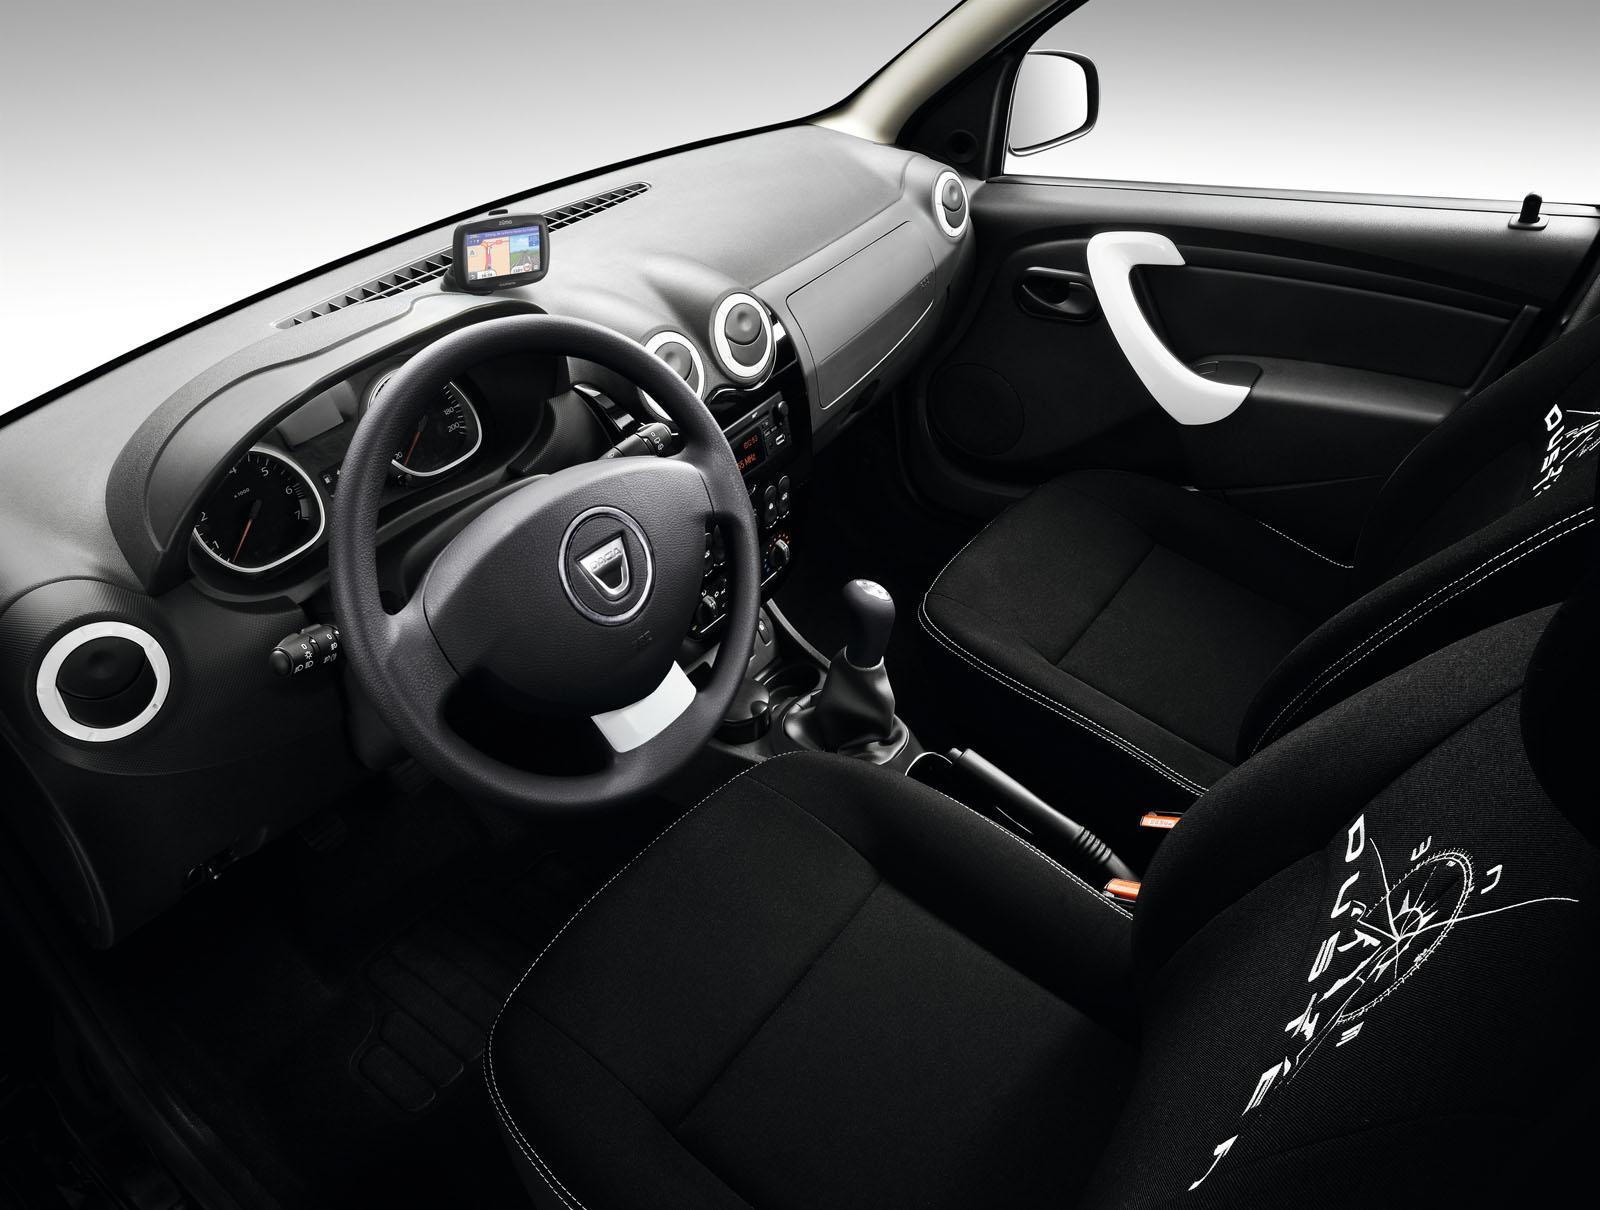 2013 Geneva Motor Show: Dacia Duster Adventure Edition  - фотография №13